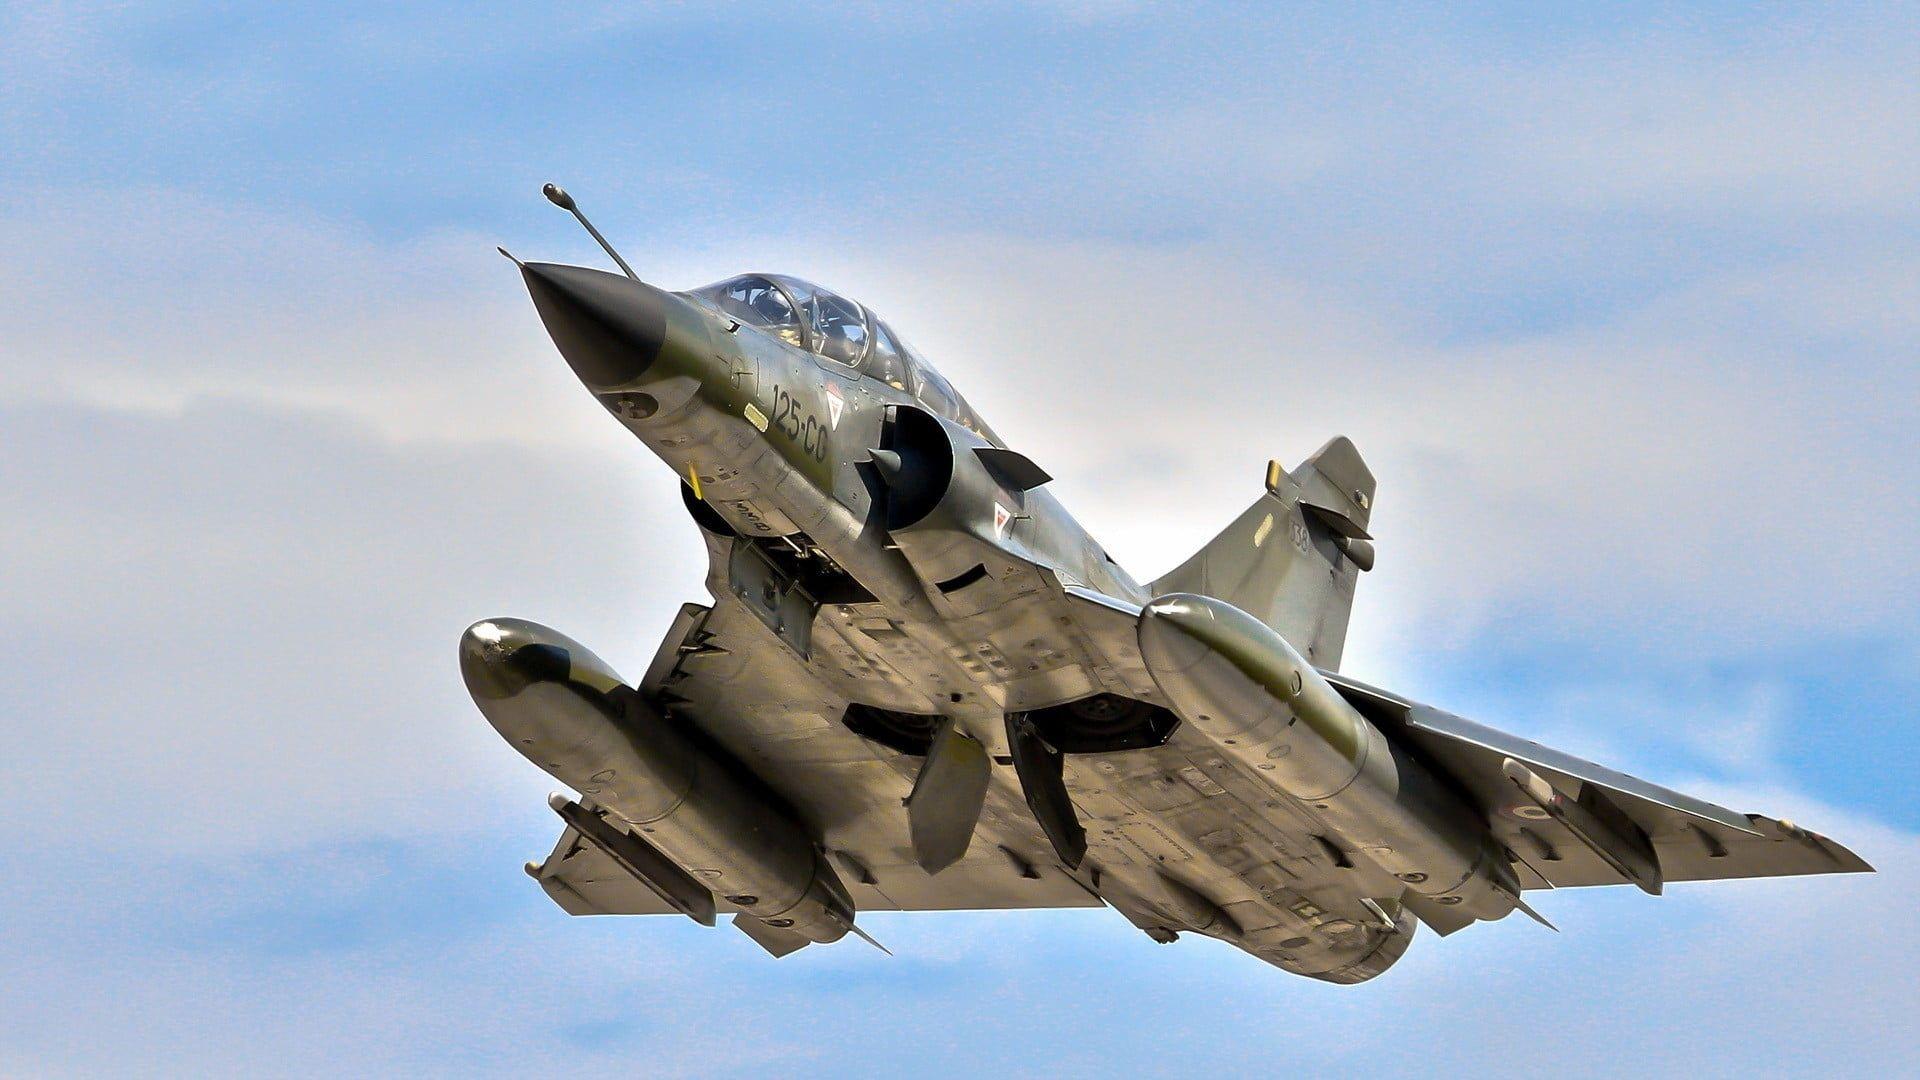 Обои nevada, fighter jet, israeli defense force, las vegas, nellis air force base. Авиация foto 8